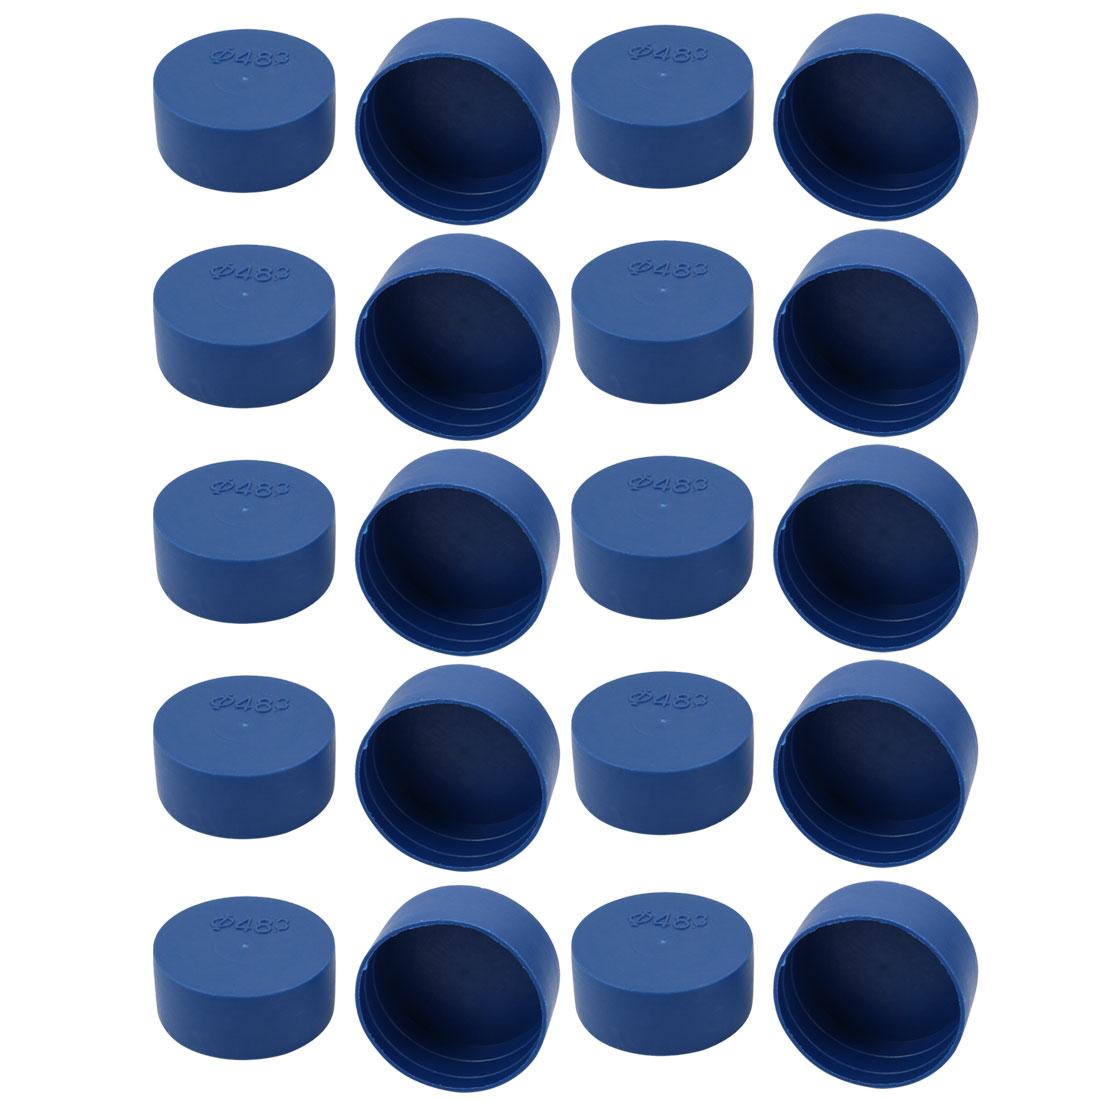 20pcs 48mm Inner Dia PE Plastic End Cap Bolt Thread Protector Tube Cover Blue